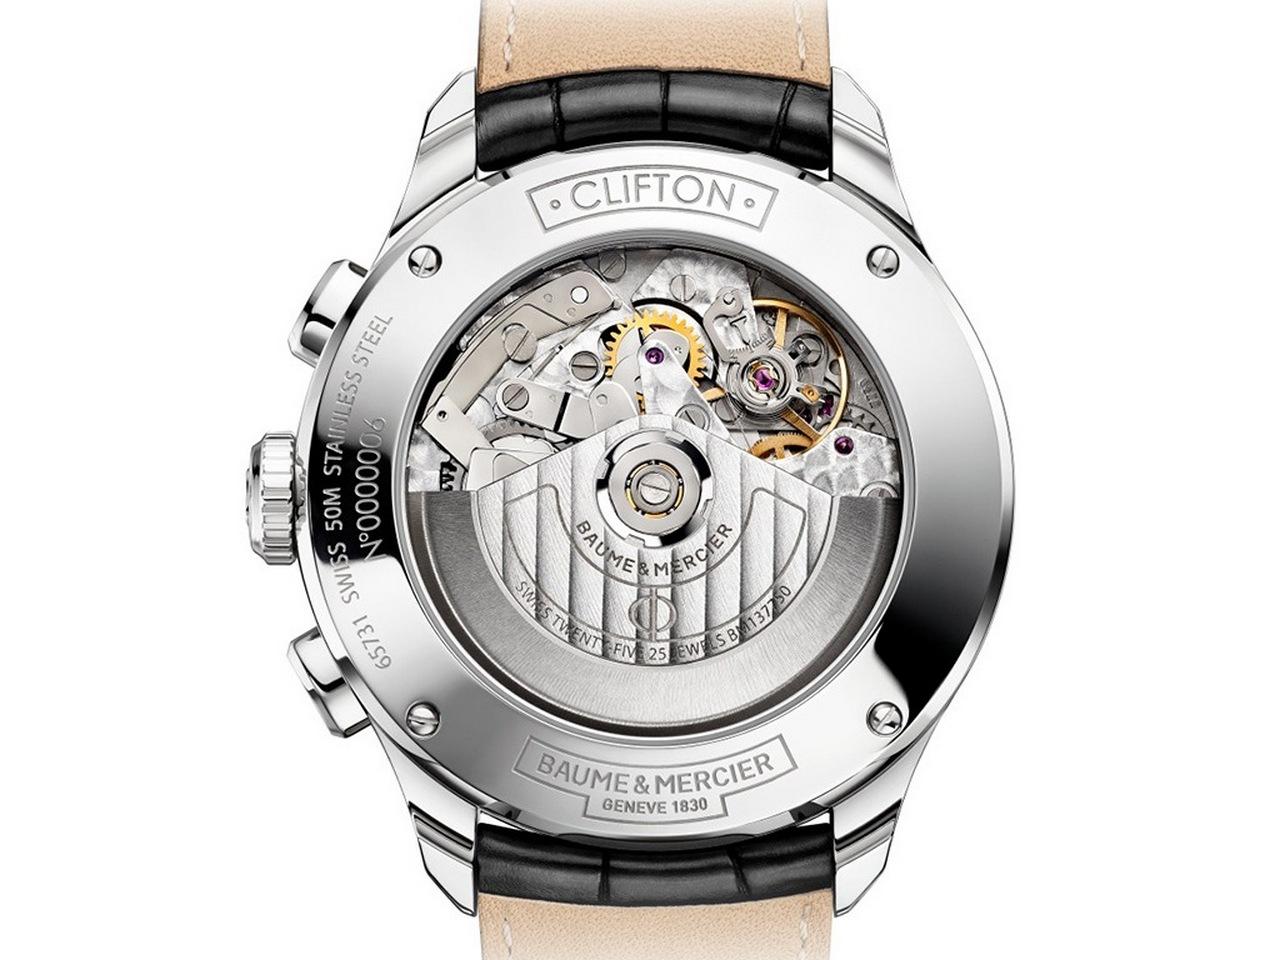 anteprima-sihh-2014-baume-mercier-clifton-chronographs-0-100_3